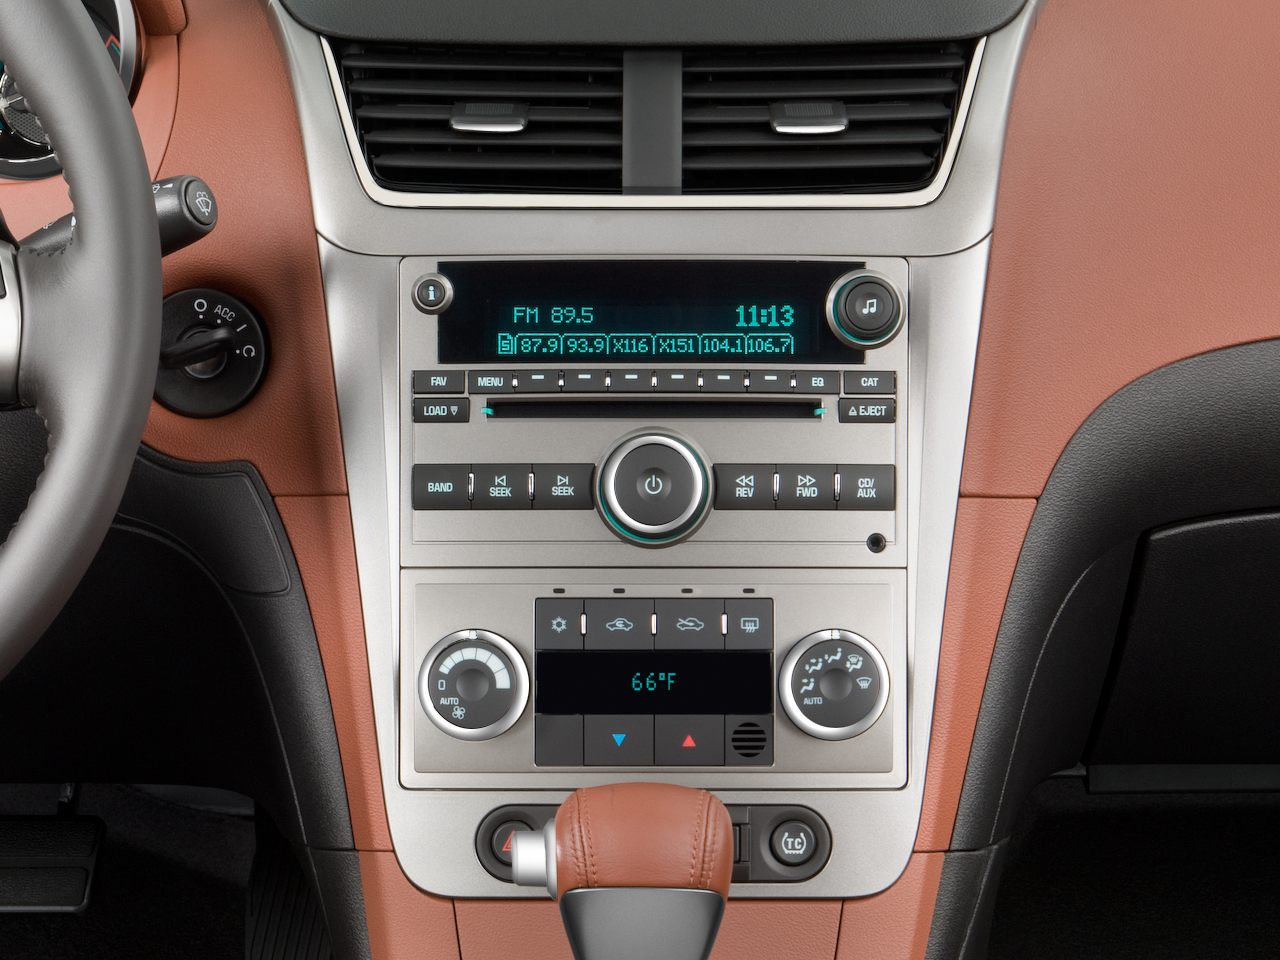 2009 chevy malibu ltz fuel efficient news car features and rh automobilemag com 2008 Chevy Malibu LT Dashboard 2008 Chevy Malibu Interior Colors